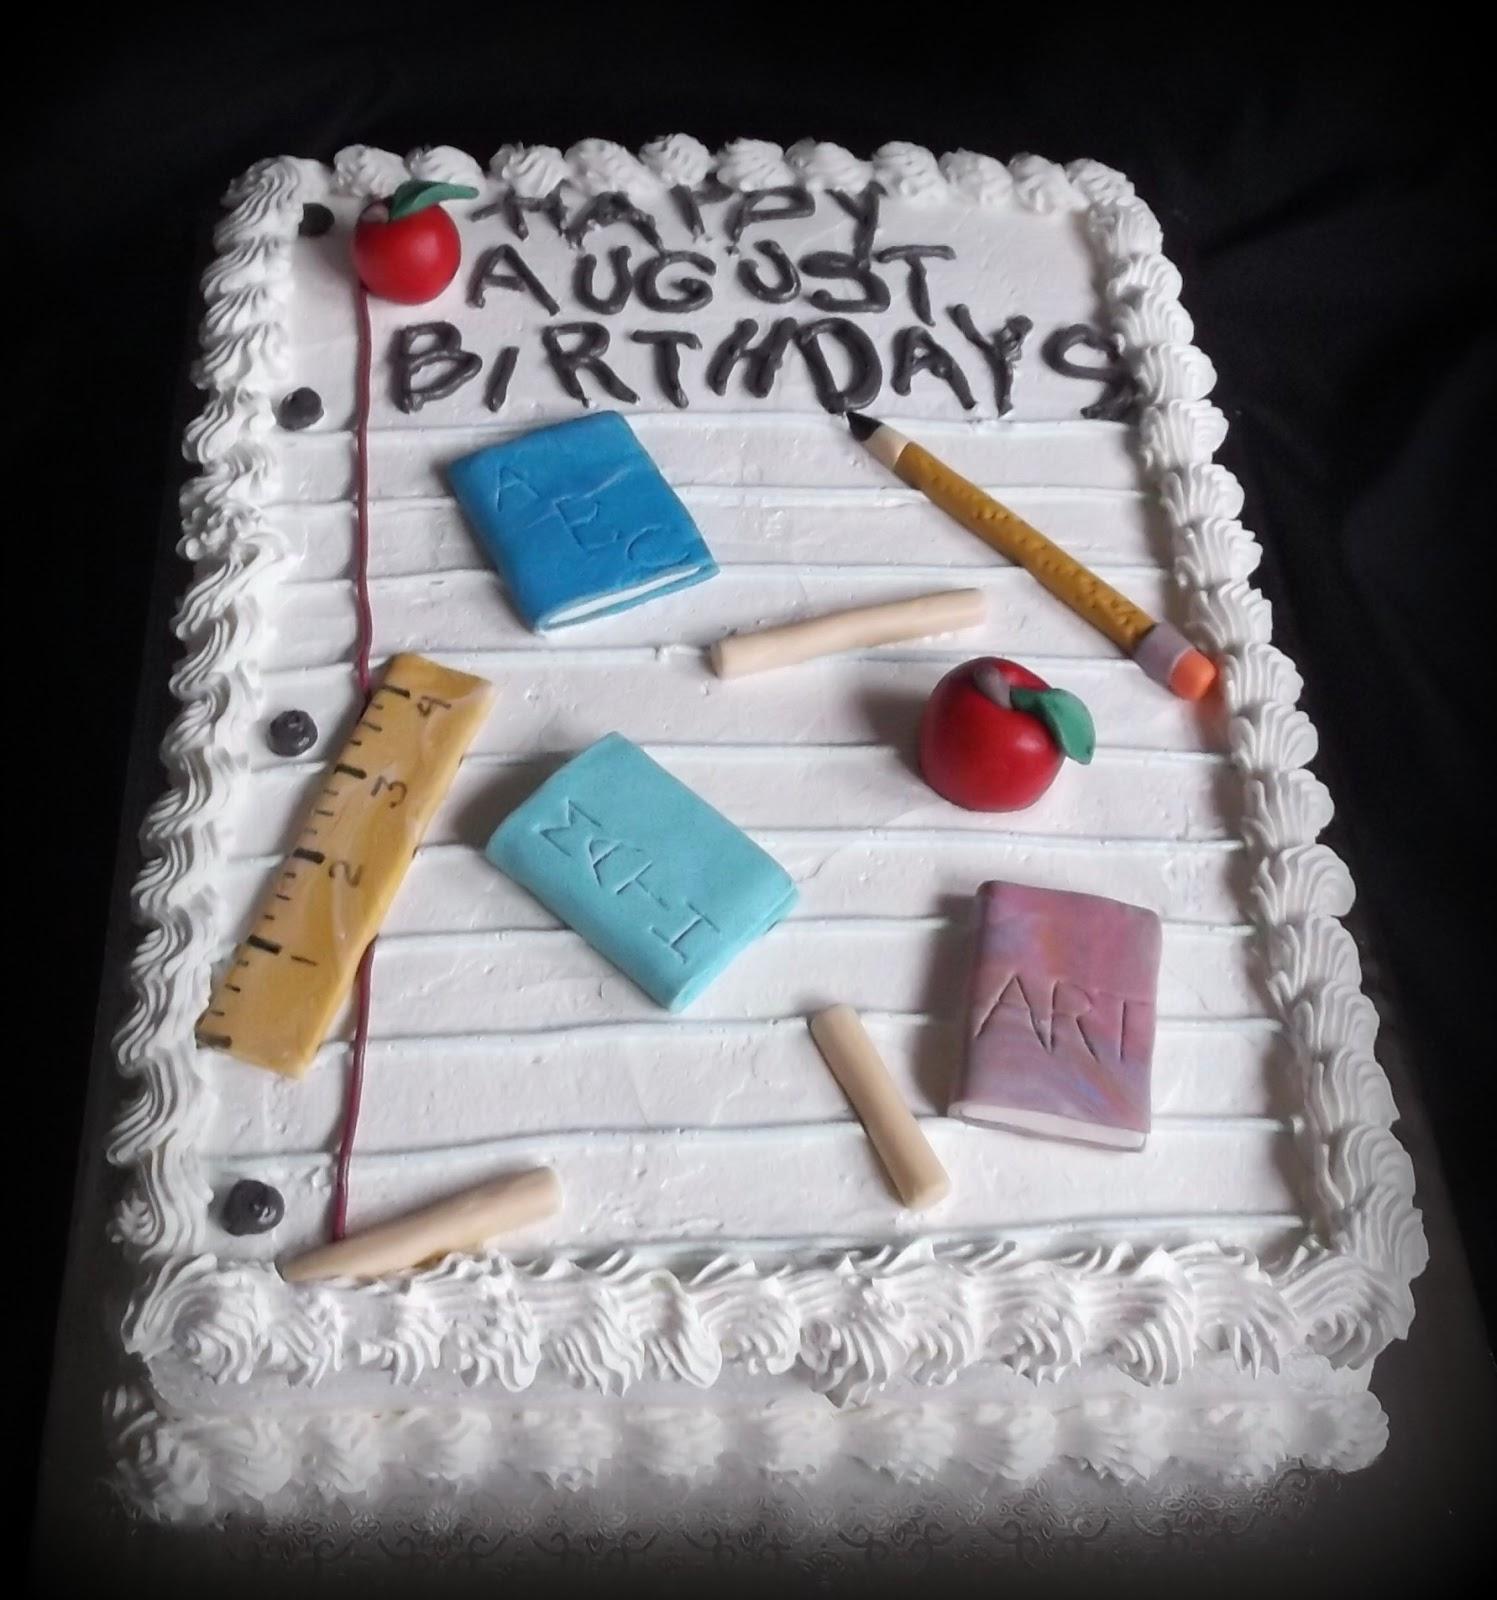 Ks Cakes August Birthdays Cake For An Office